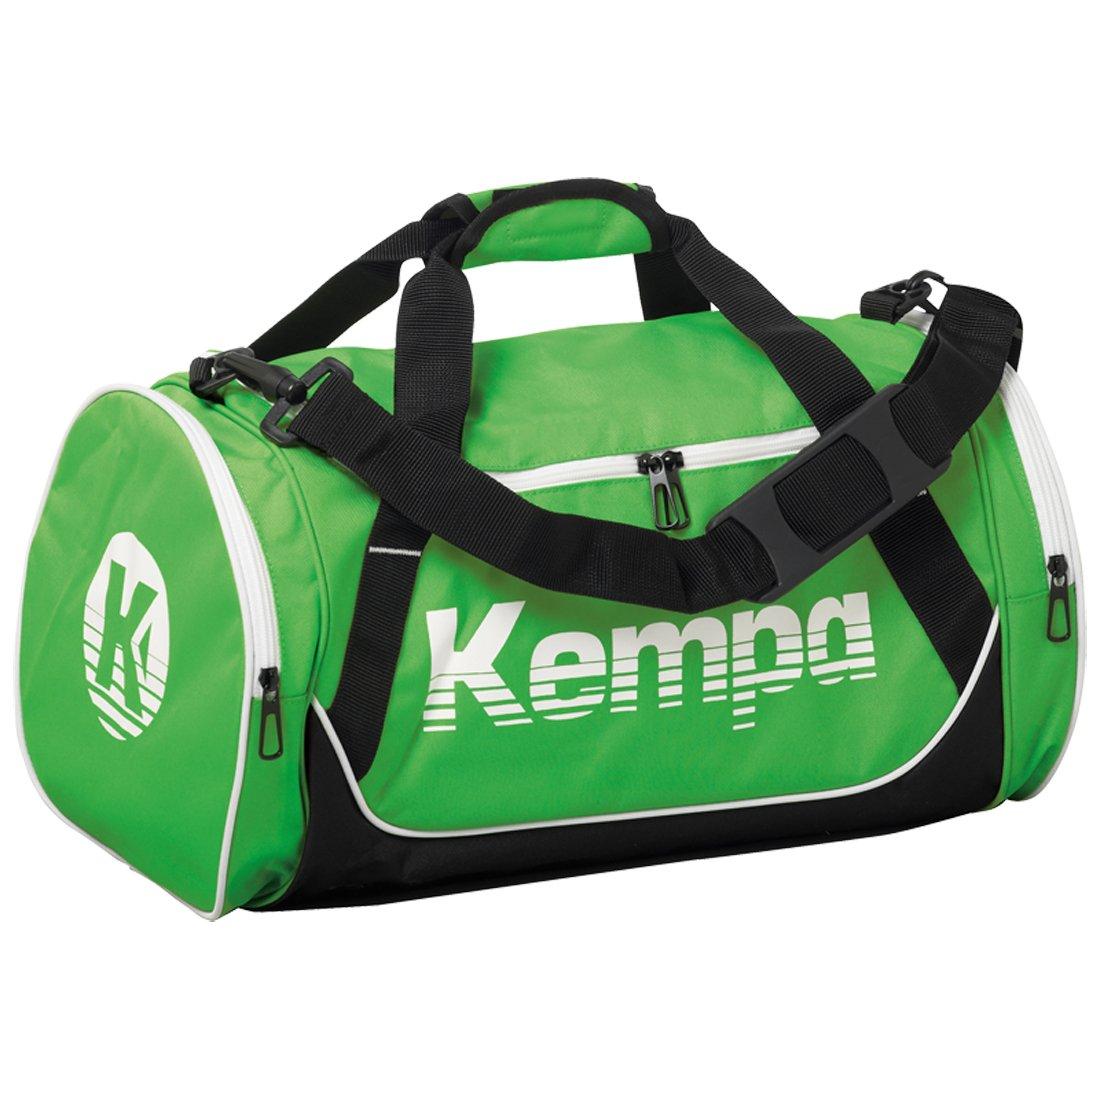 Kempa Sports Bag Sporttasche, 45 cm, 75 liters, Grün (Verde) Grün (Verde) 200489605